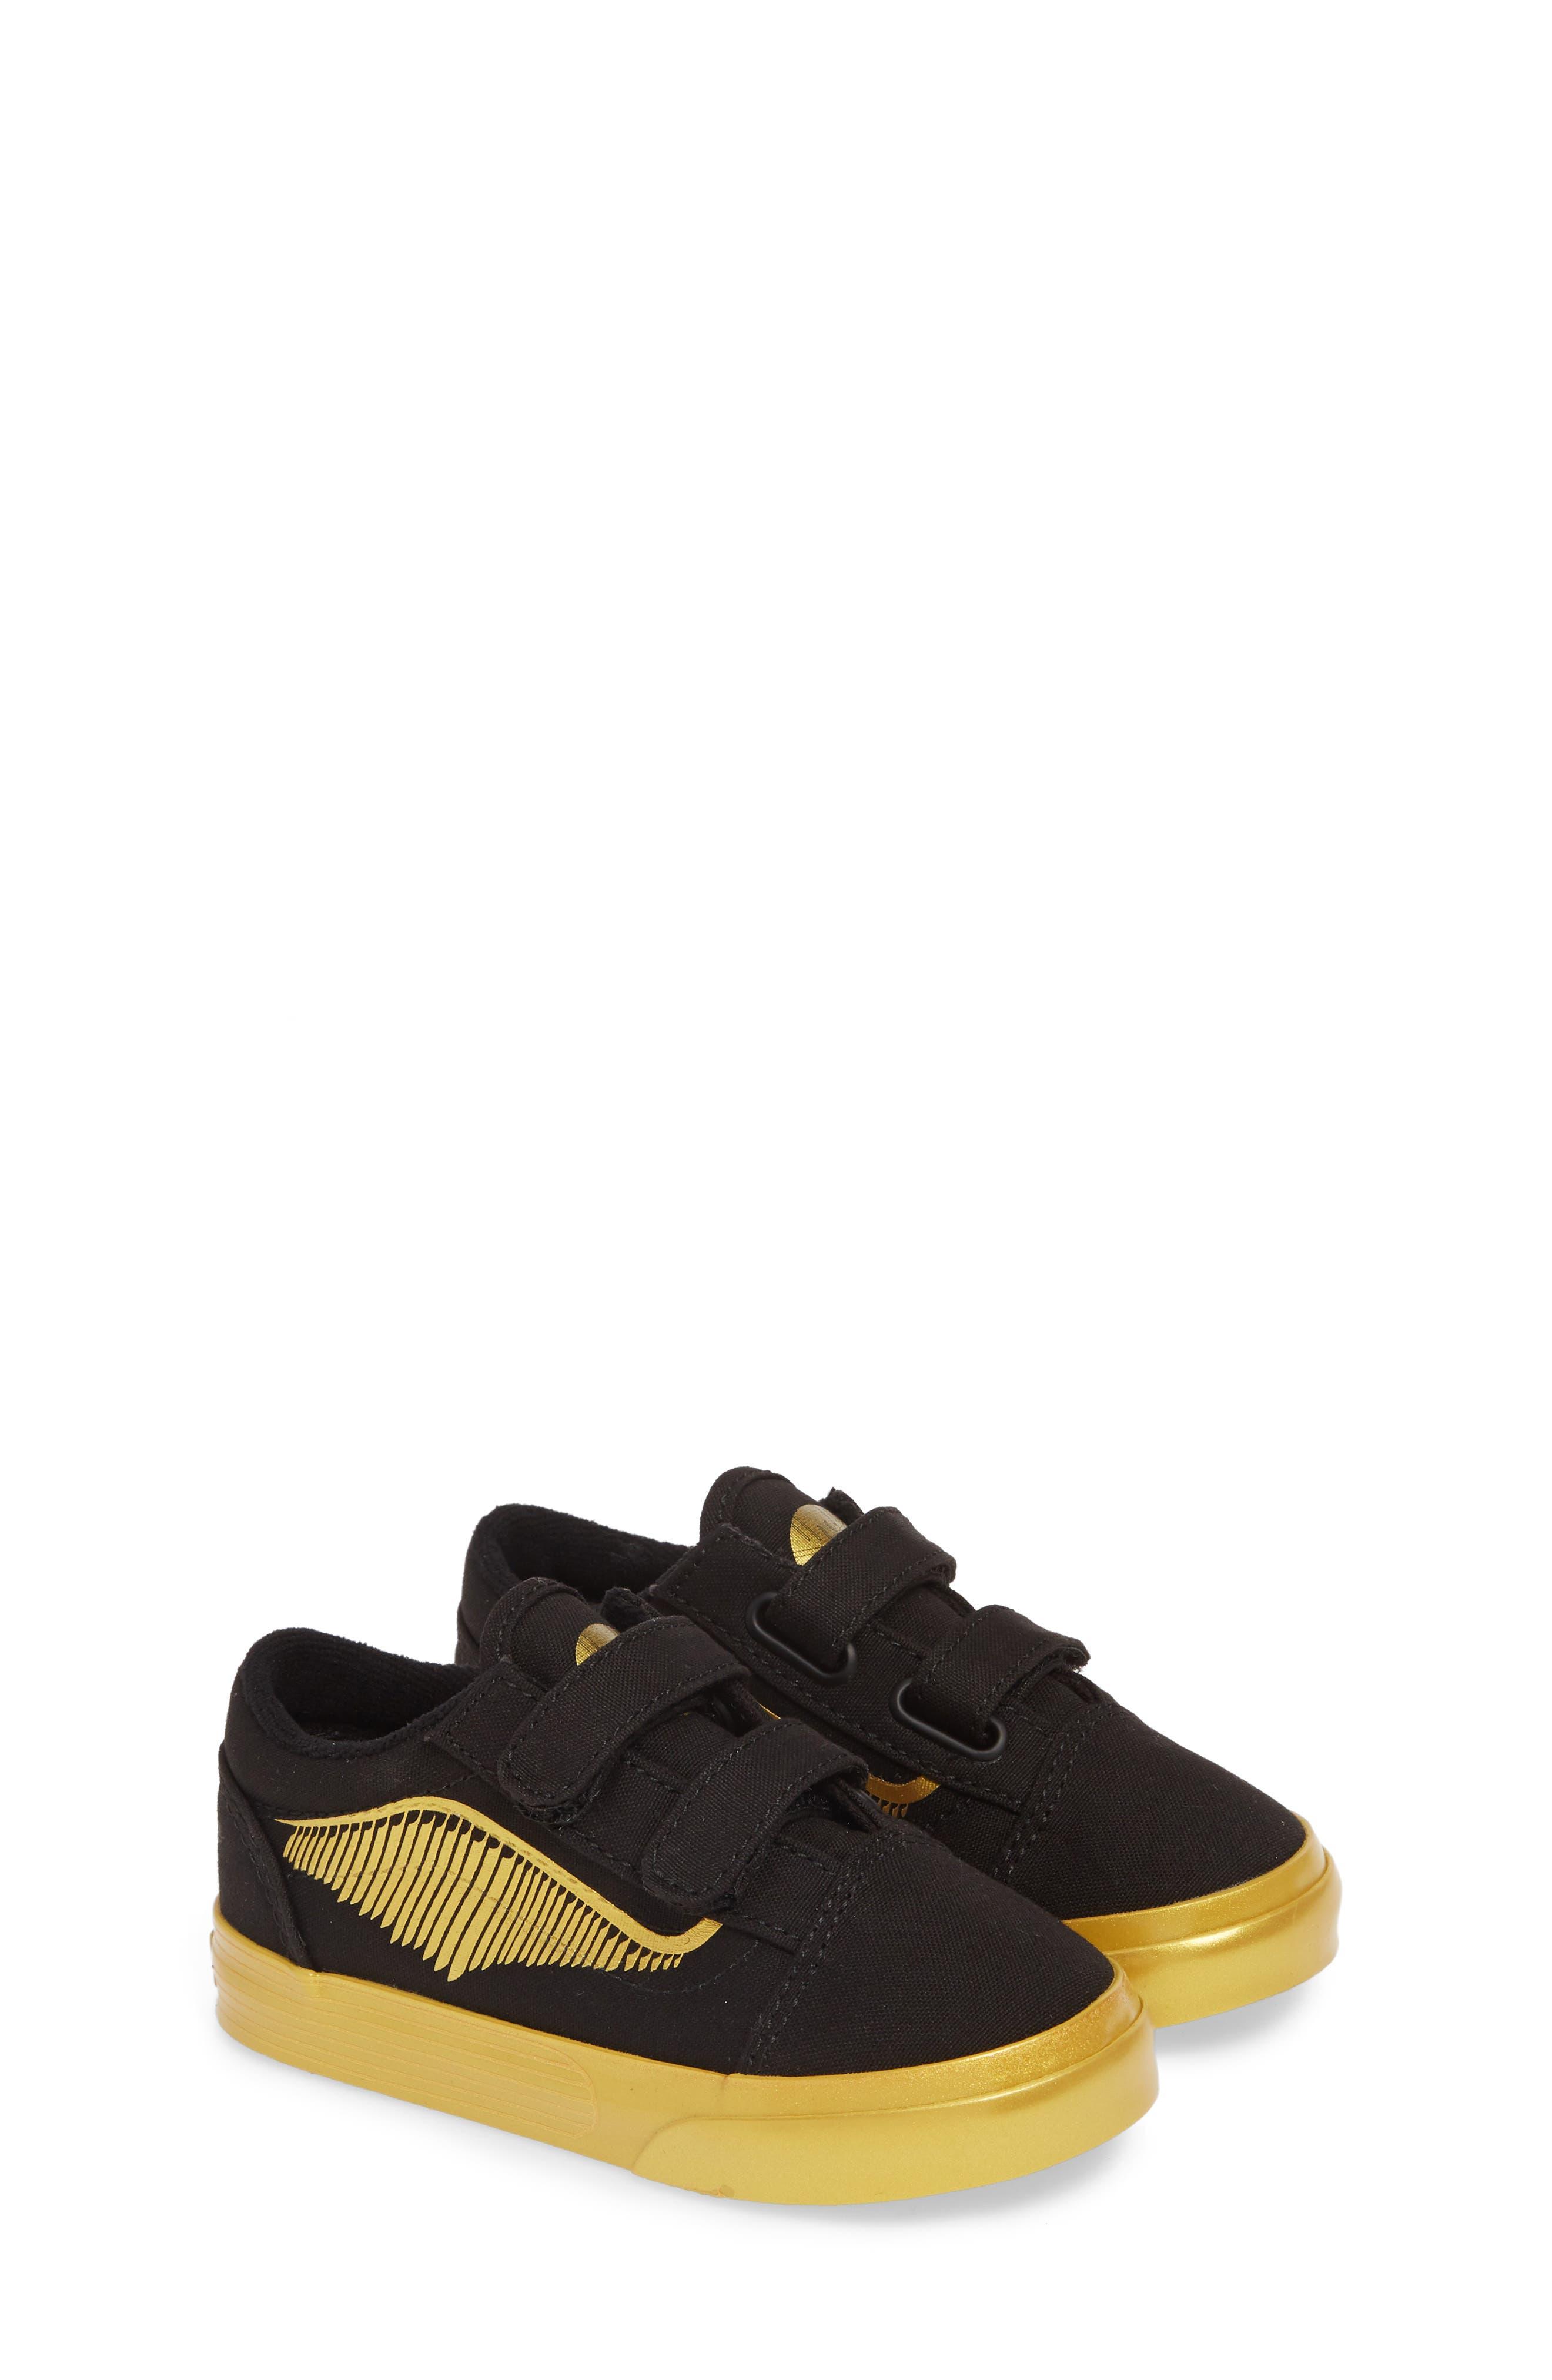 Vans x Harry Potter Old Skool V Sneaker